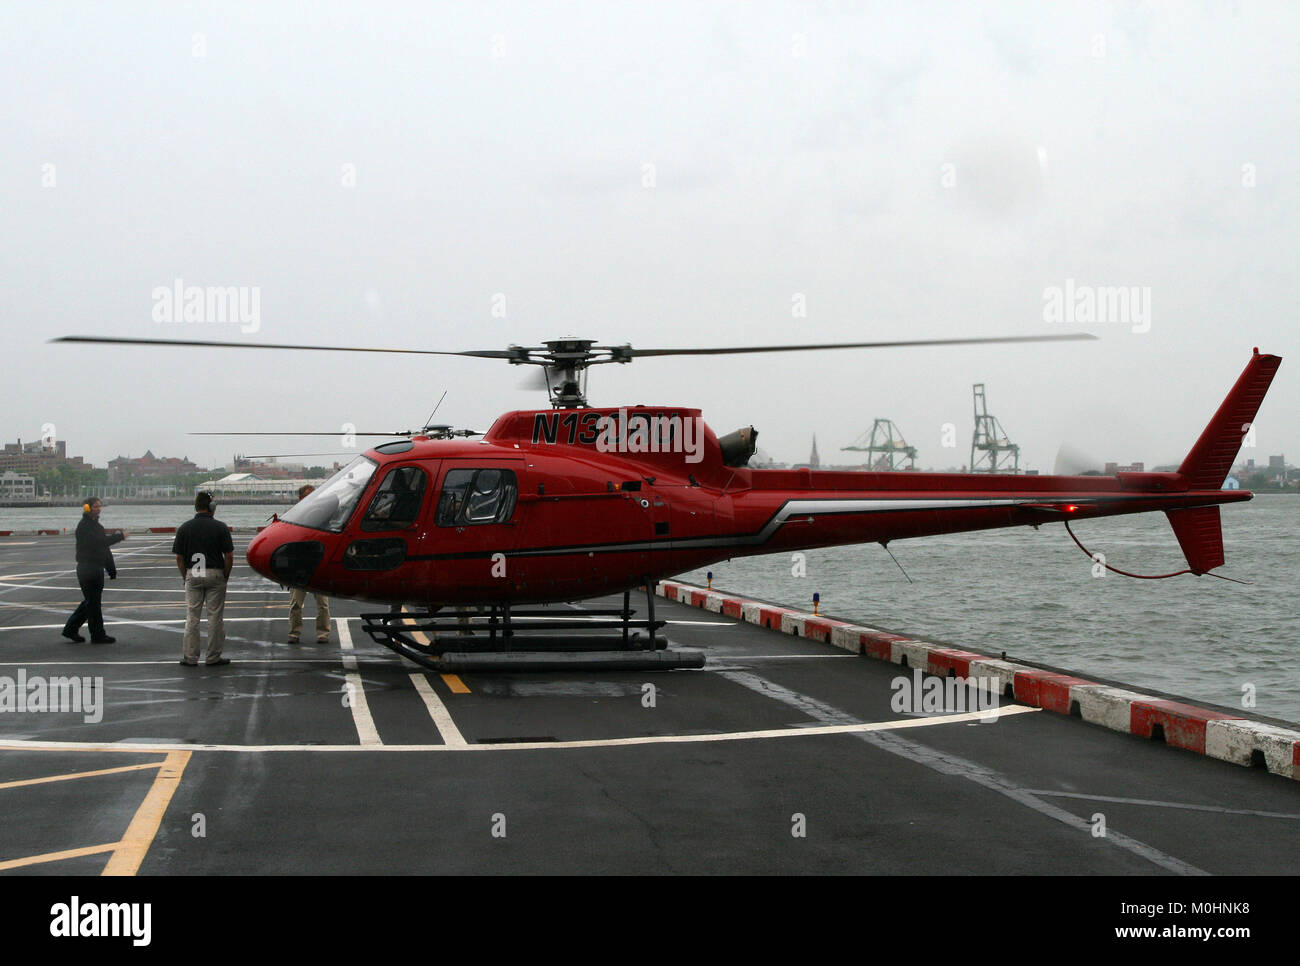 Elicottero 350 : Eurocopter as 350 immagini & eurocopter as 350 fotos stock alamy